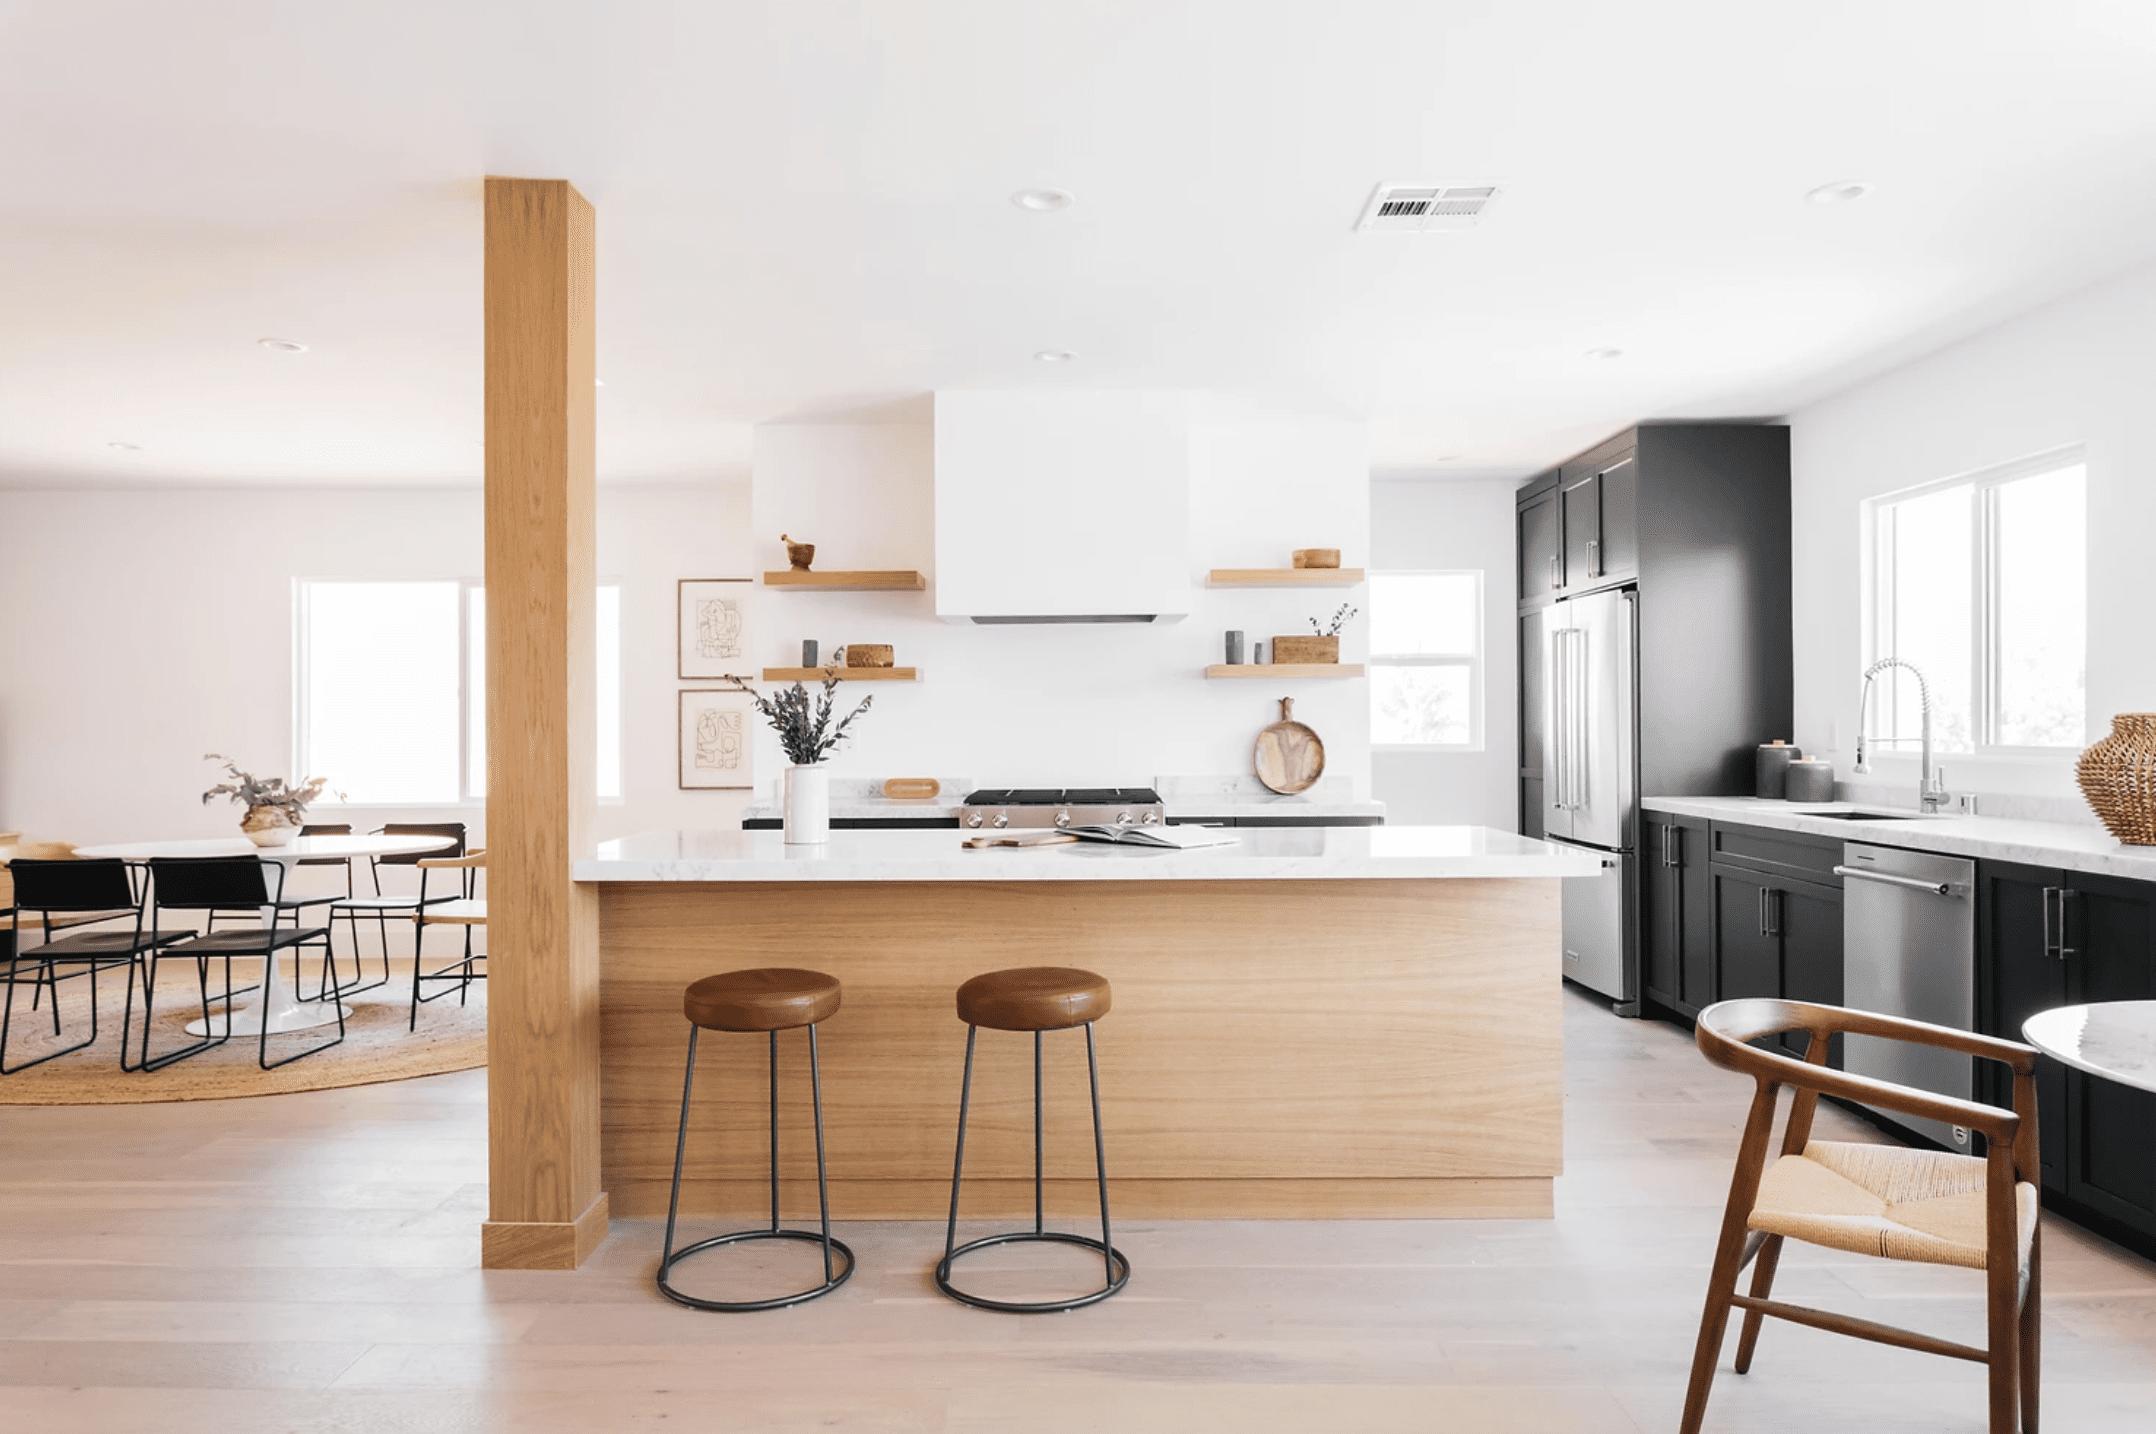 All white kitchen in white, brown, black palette